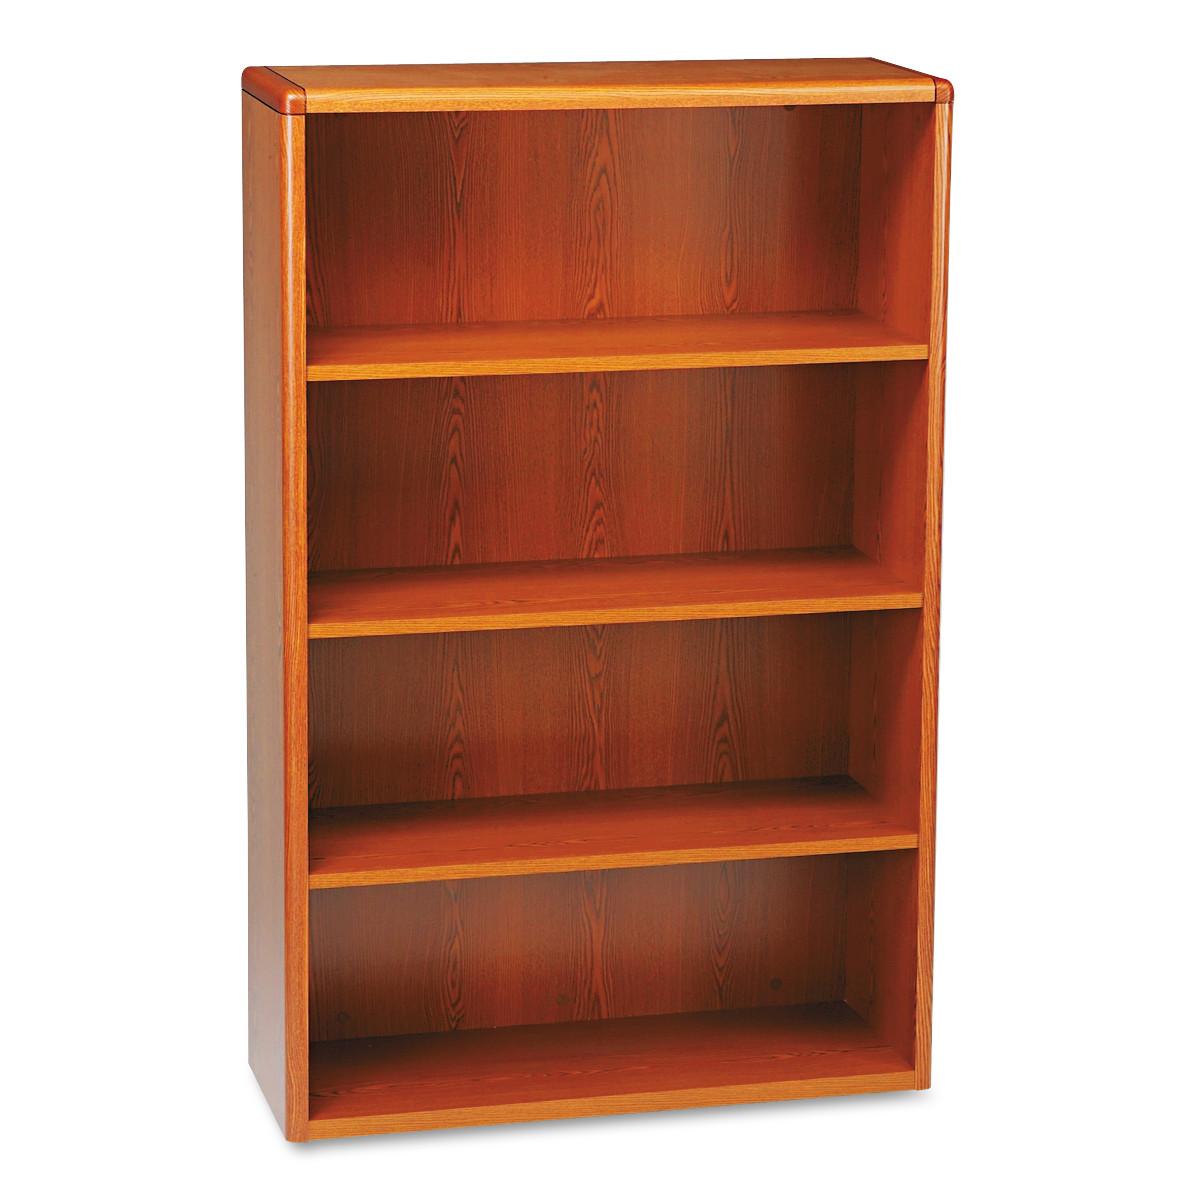 HON 10700 Series Wood Bookcase, Four Shelf, 36w x 13 1/8d x 57 1/8h, Henna Cherry